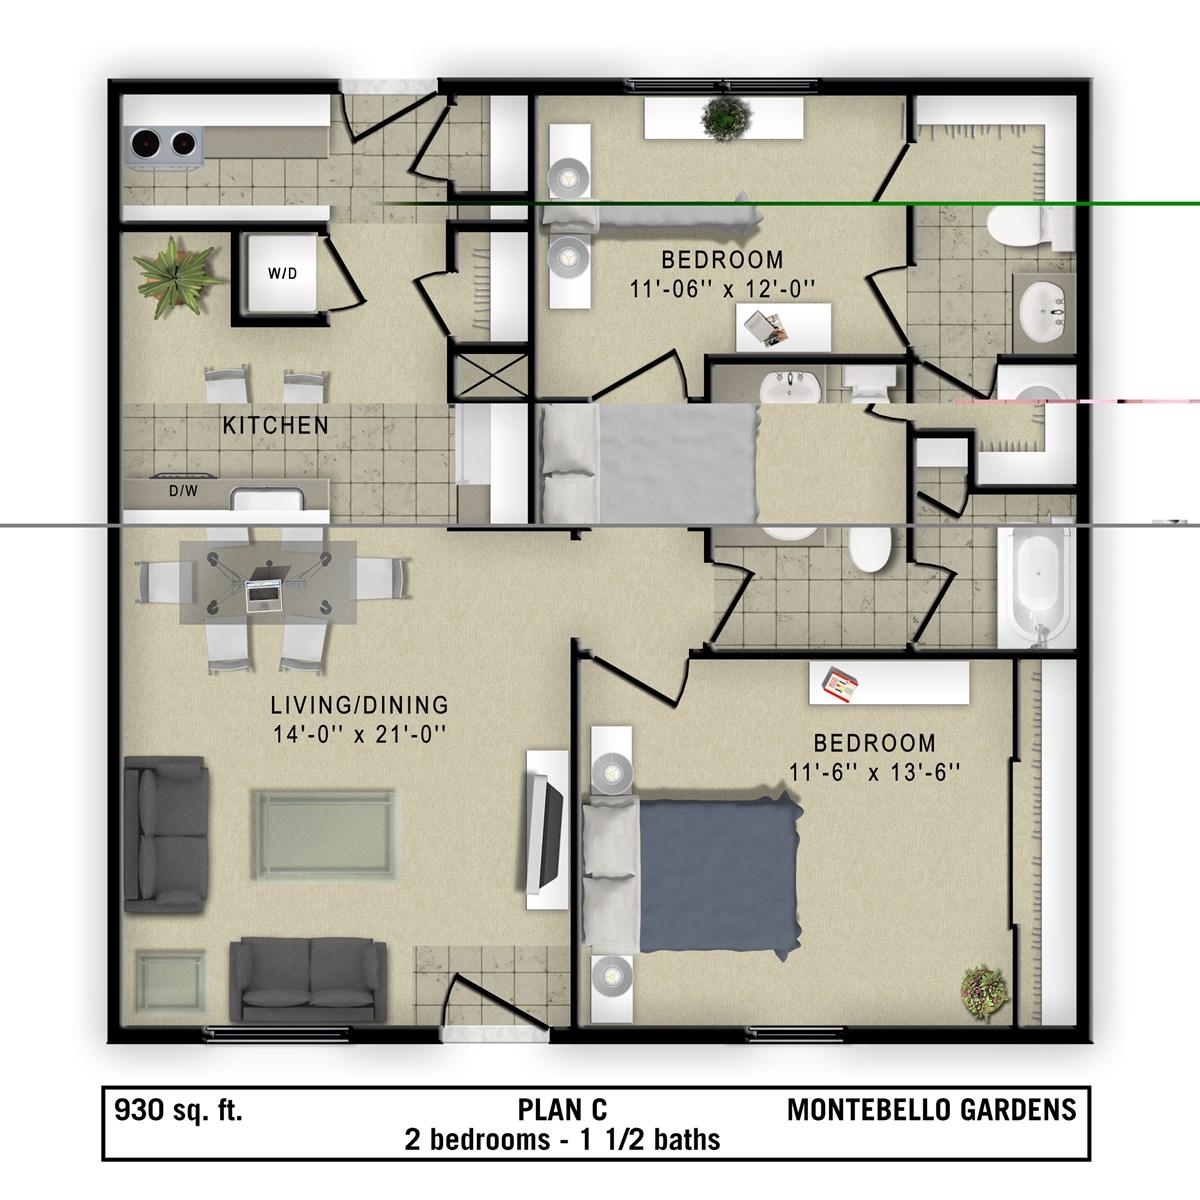 930 sq. ft. Torino floor plan